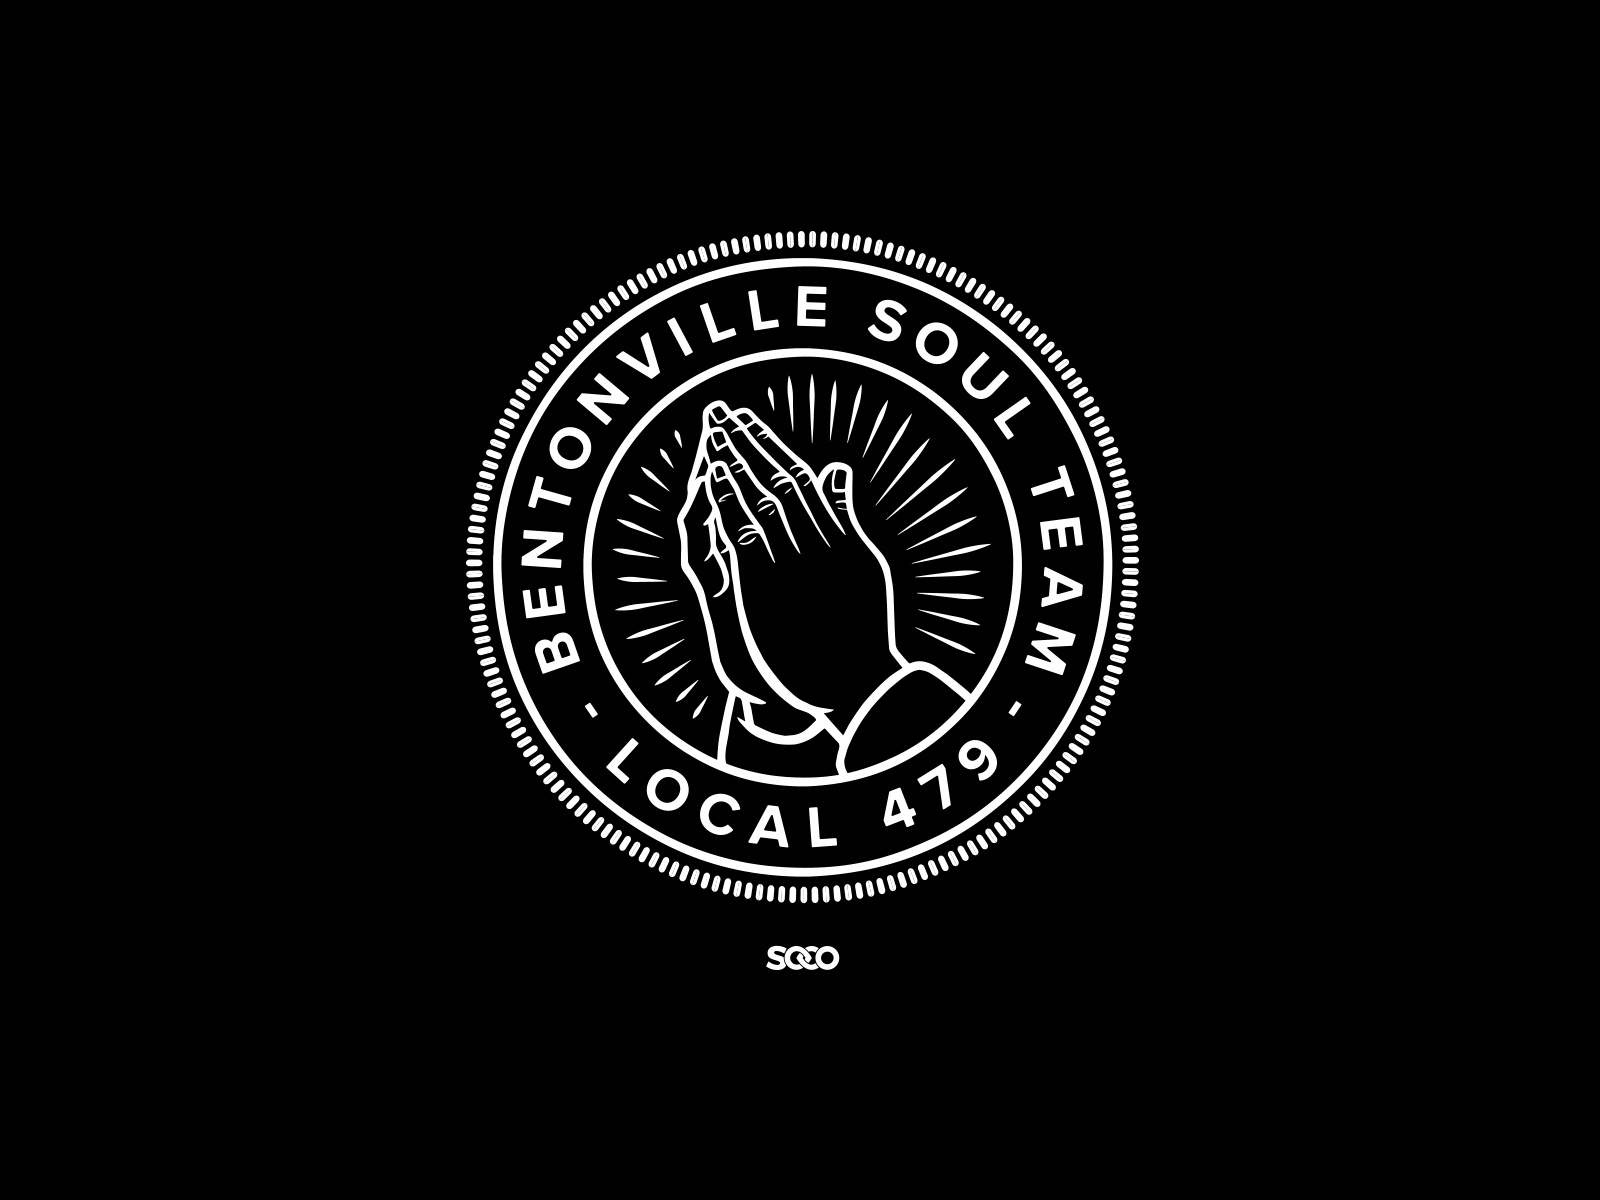 Bentonville Soul Team - LOCAL 479 by Kevin Krenzin on Dribbble